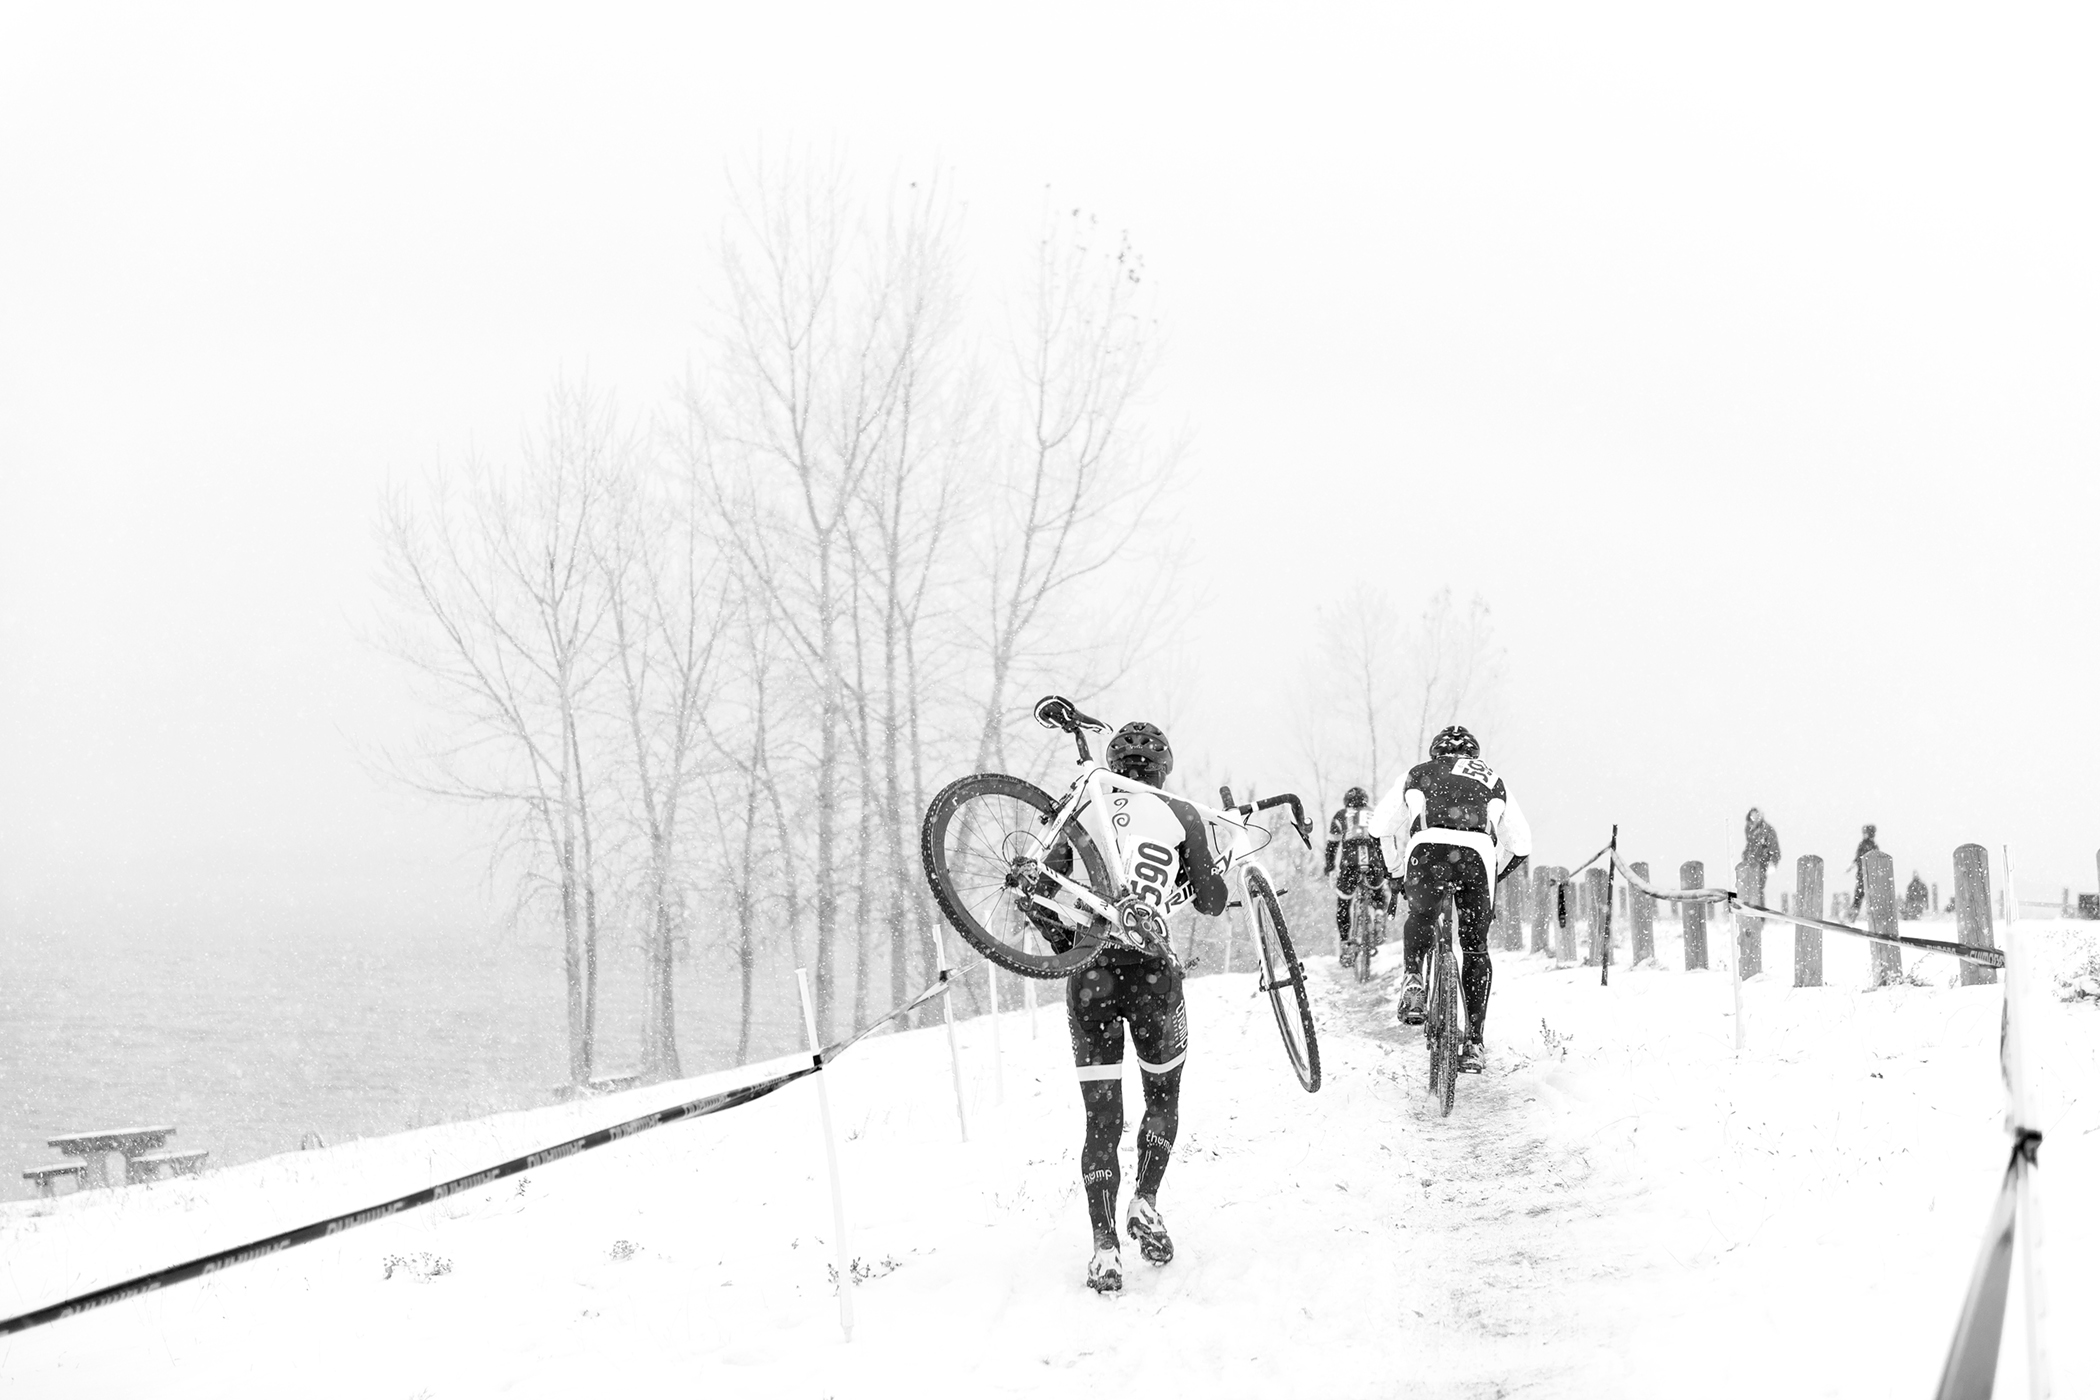 Perfect winter cyclocross conditions. Boulder Reservoir. Boulder, CO.